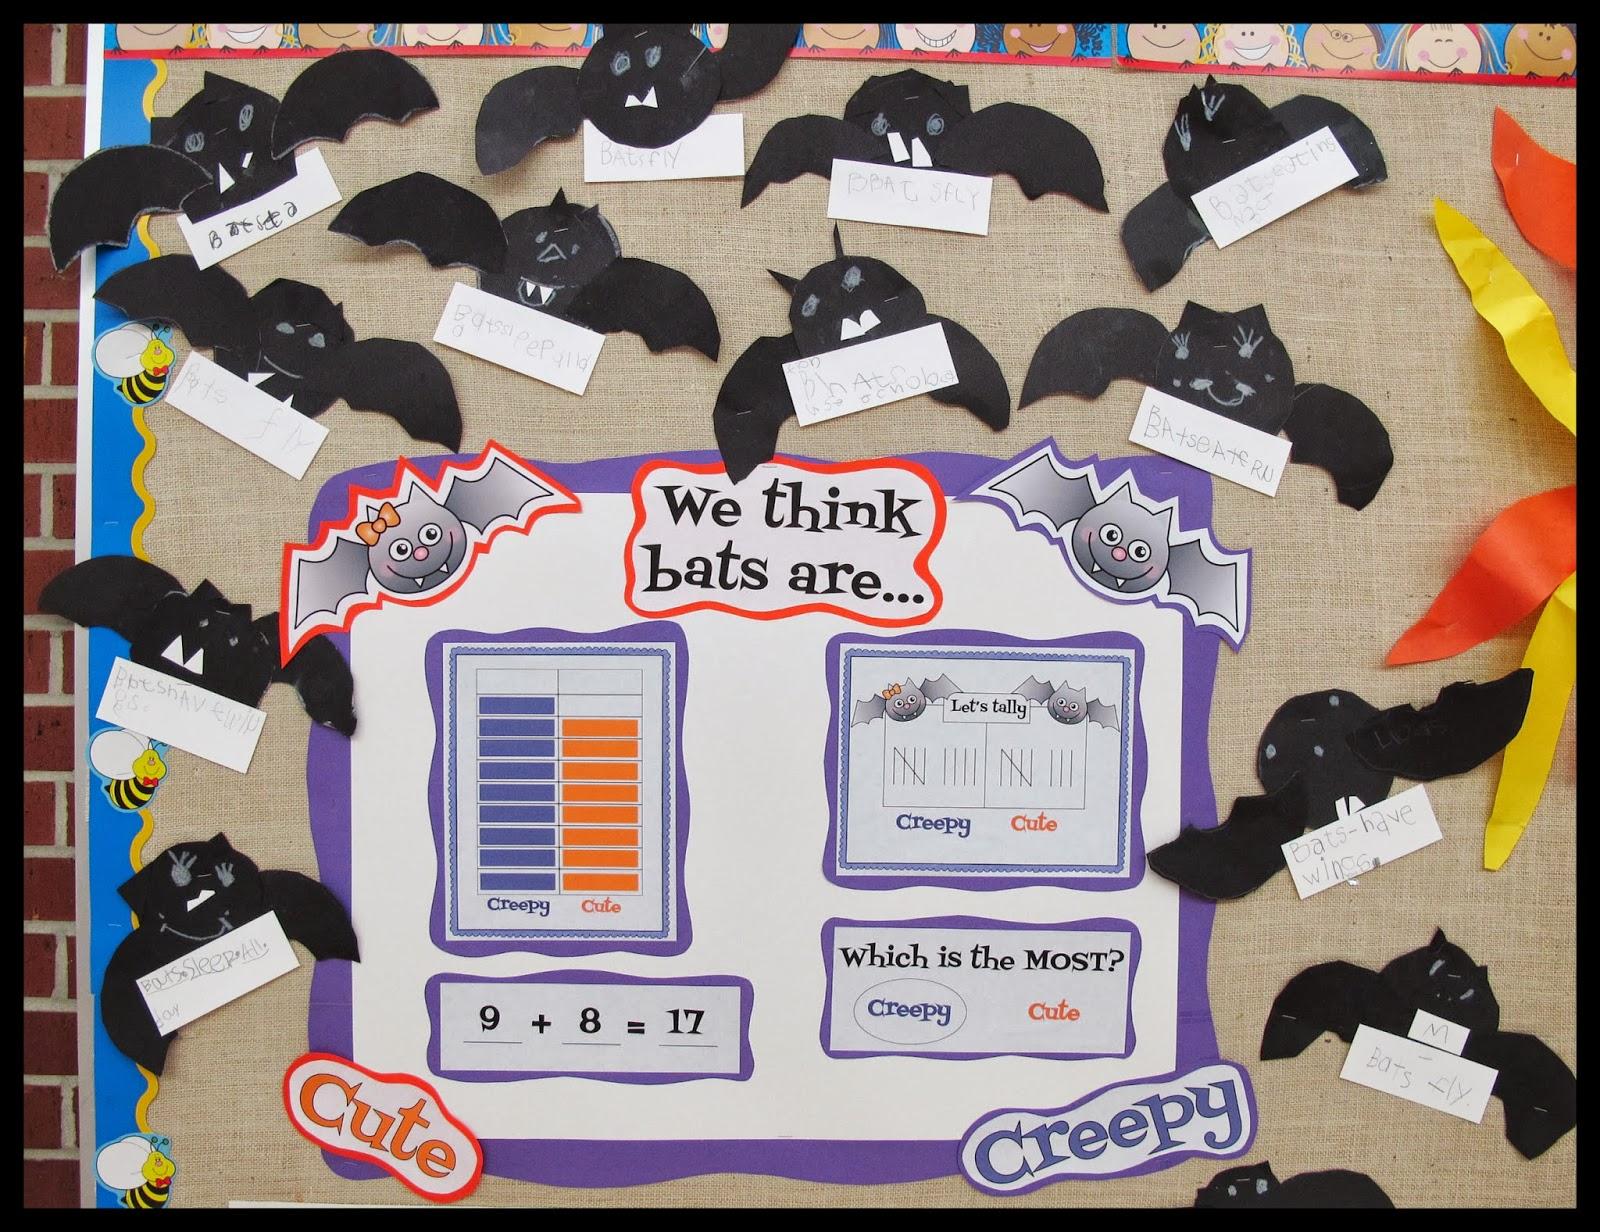 Kearson S Classroom October